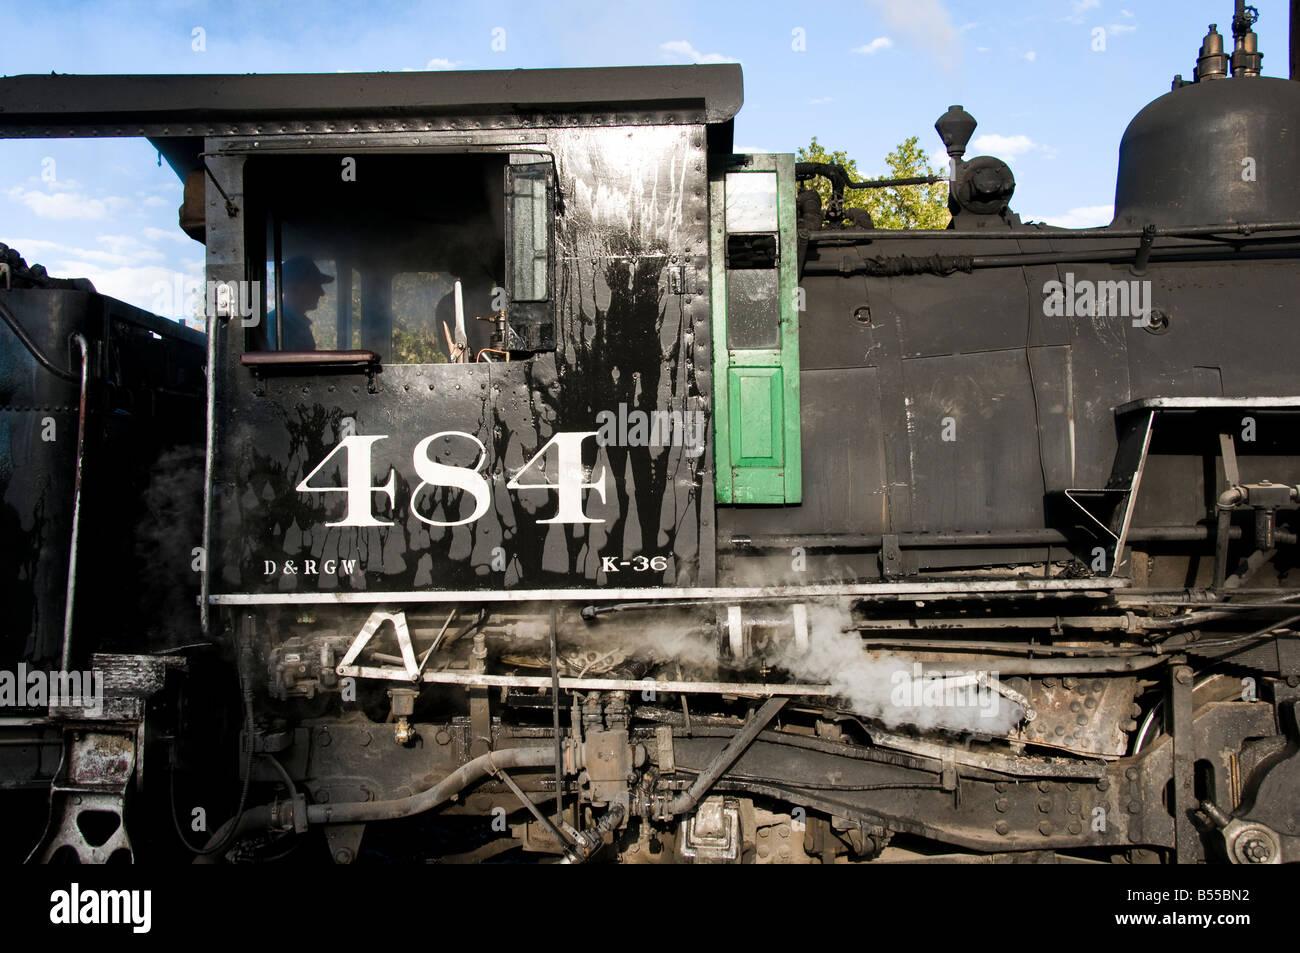 Close up of Old fashioned vintage locomotive train engine Stock Photo